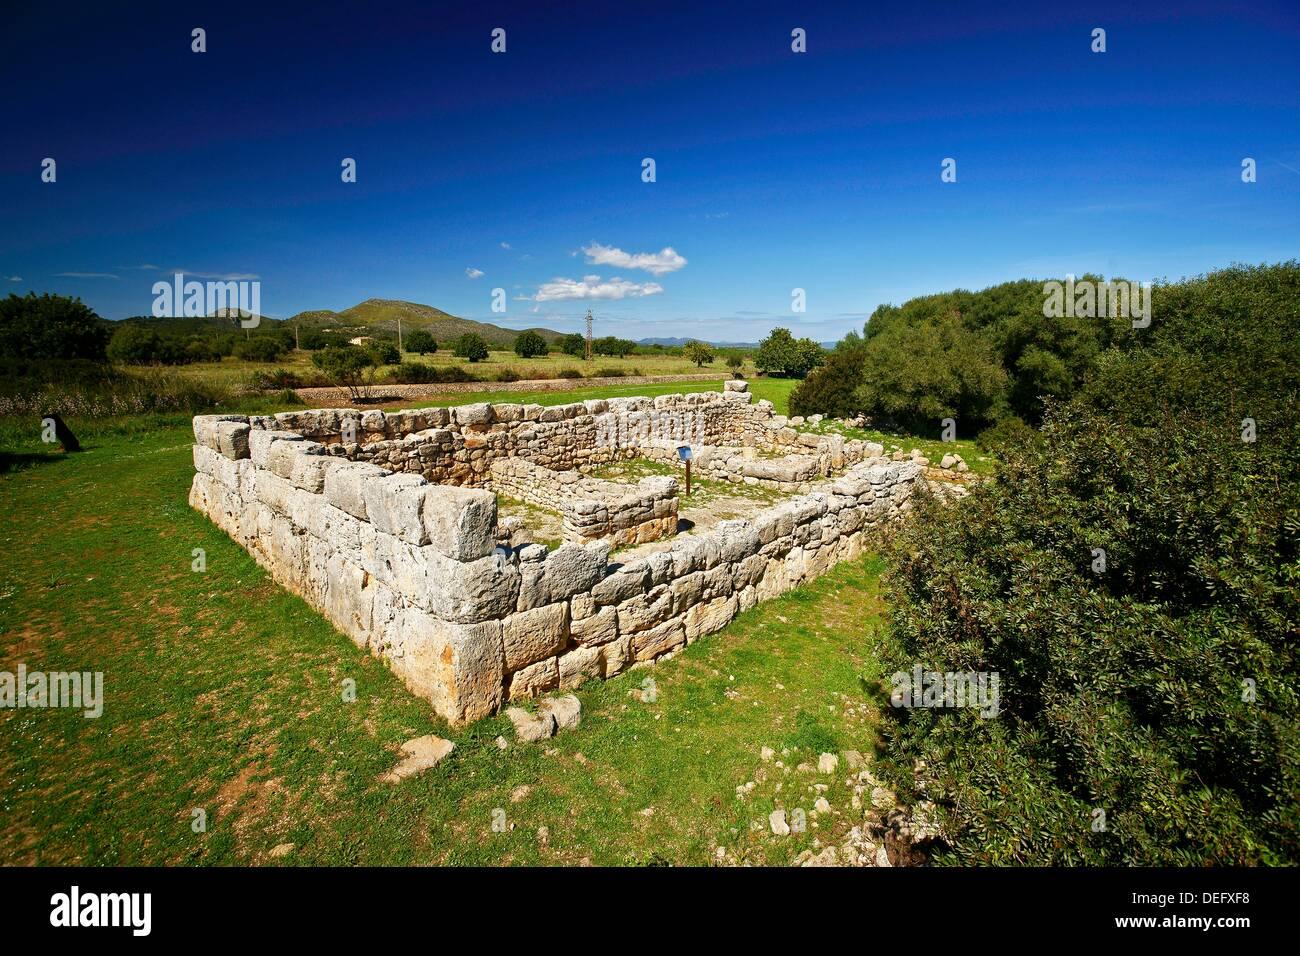 Archaeological rectangular enclosure of s´ Hospitalet Vell 1000-900 BC Balearic Islands Mallorca Spain - Stock Image